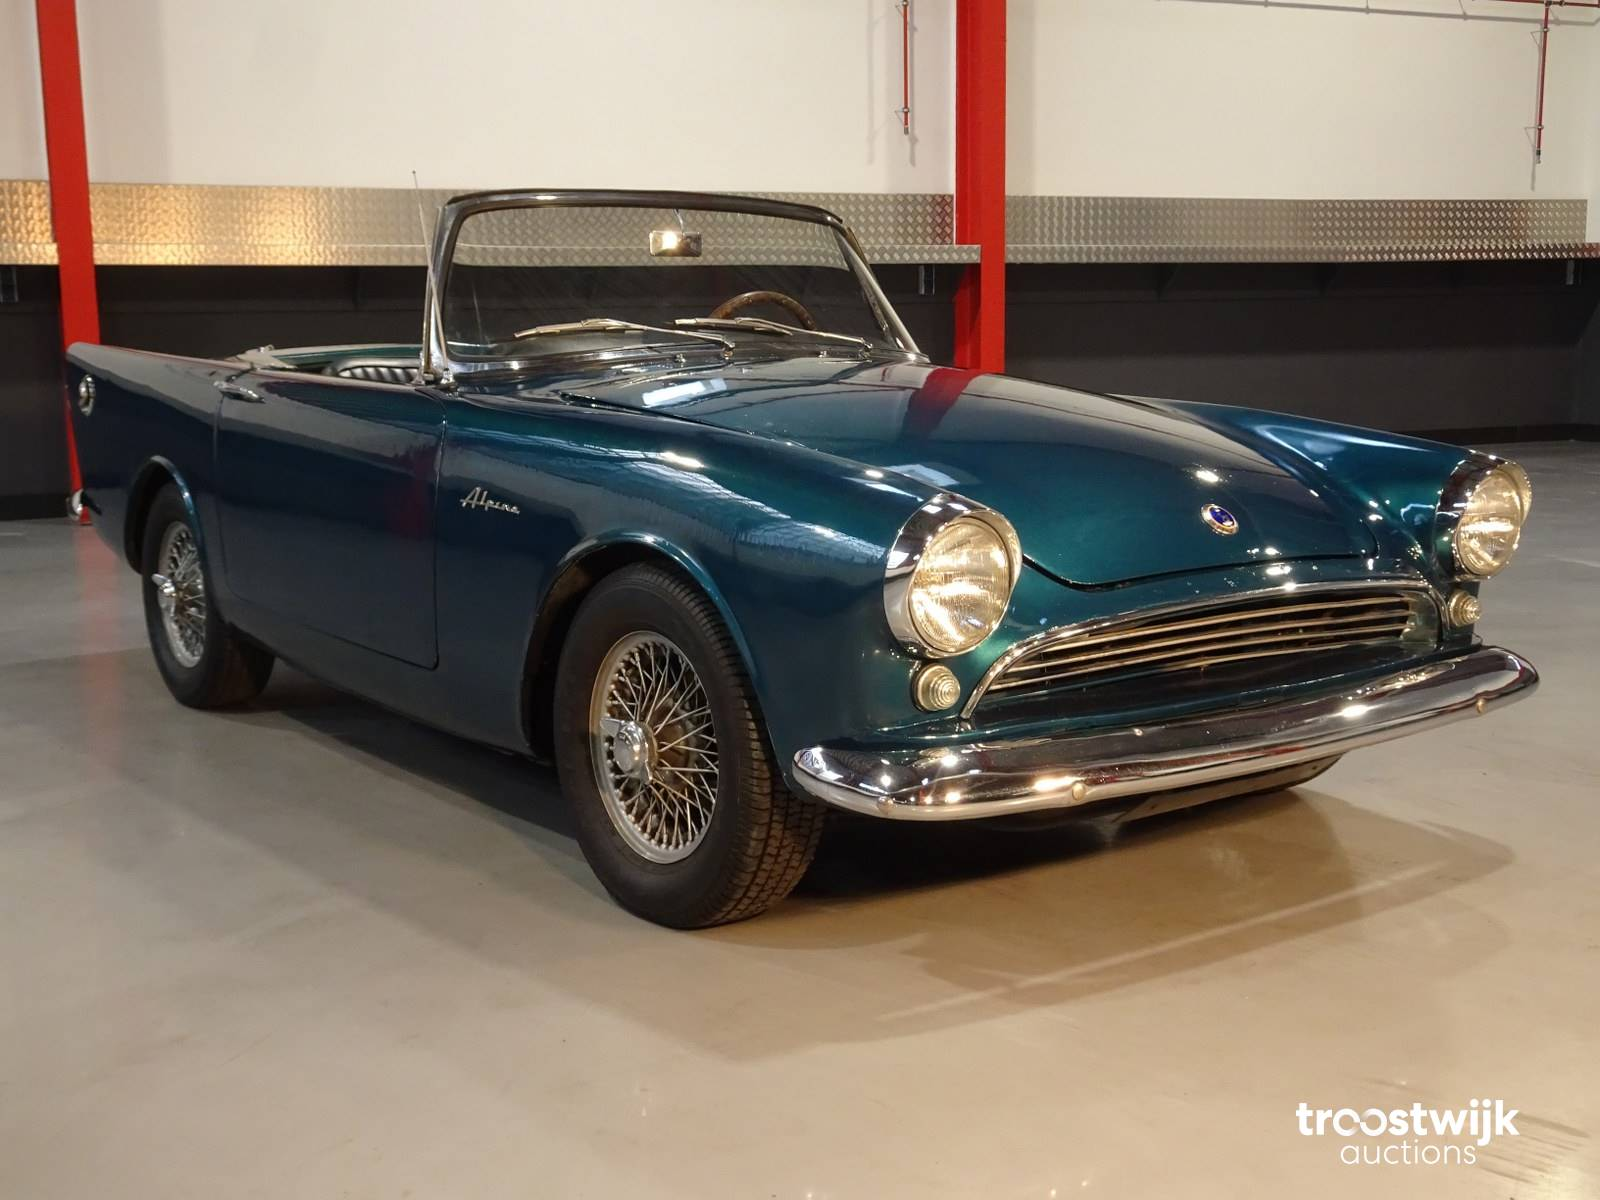 1960 Sunbeam Alpine Convertible Roadster Classic Passenger Car